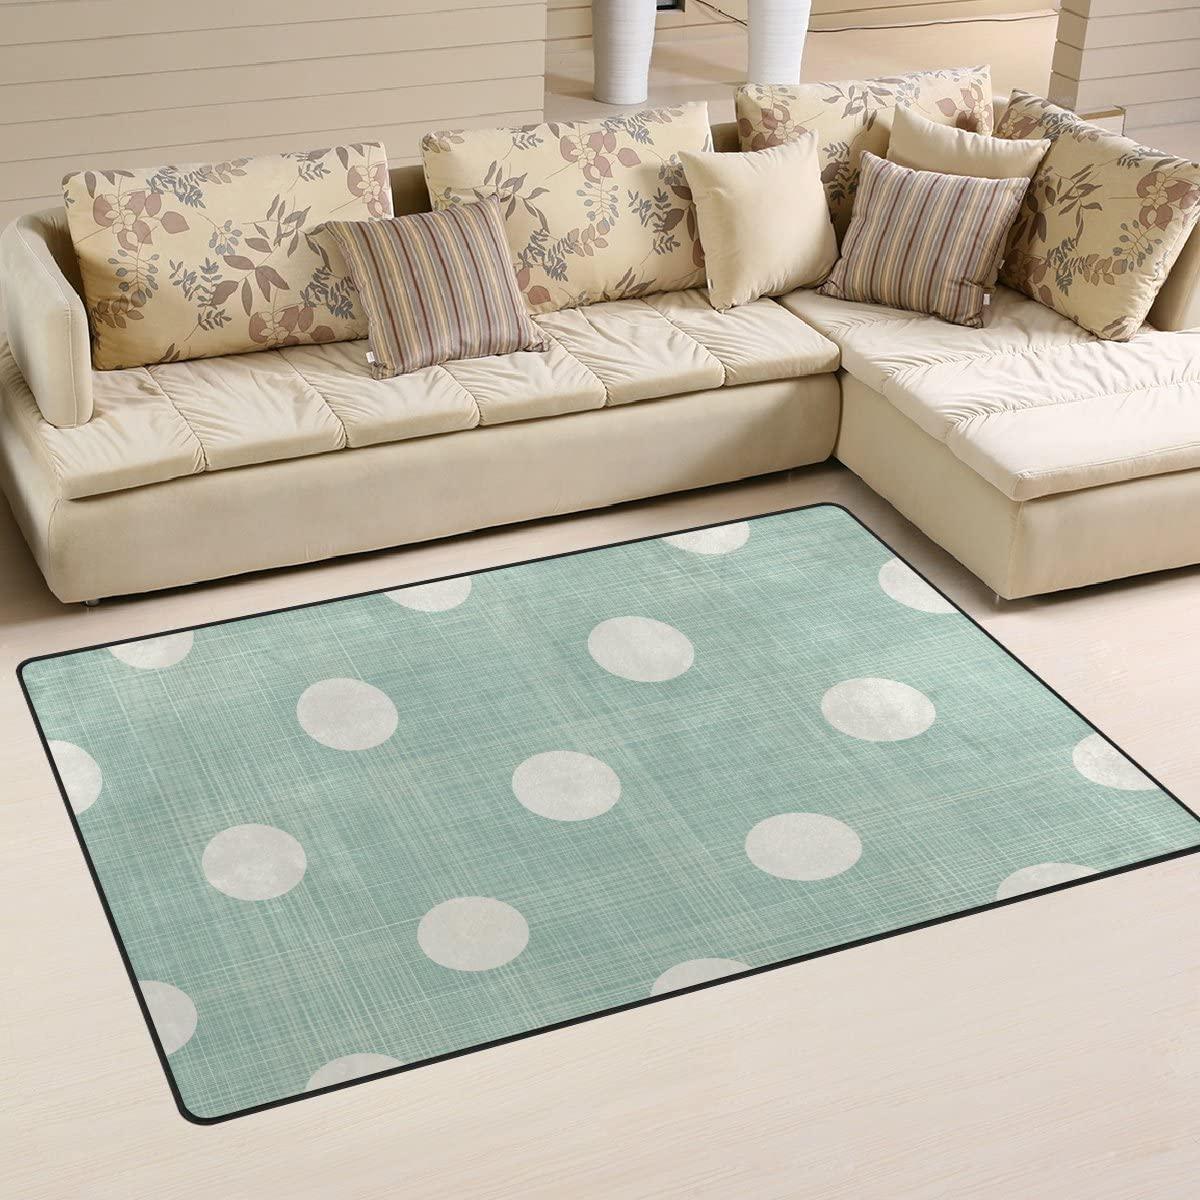 WellLee Area Rug,Rainbow Colorful Dot Glitter Floor Rug Non-Slip Doormat for Living Dining Dorm Room Bedroom Decor 31x20 Inch